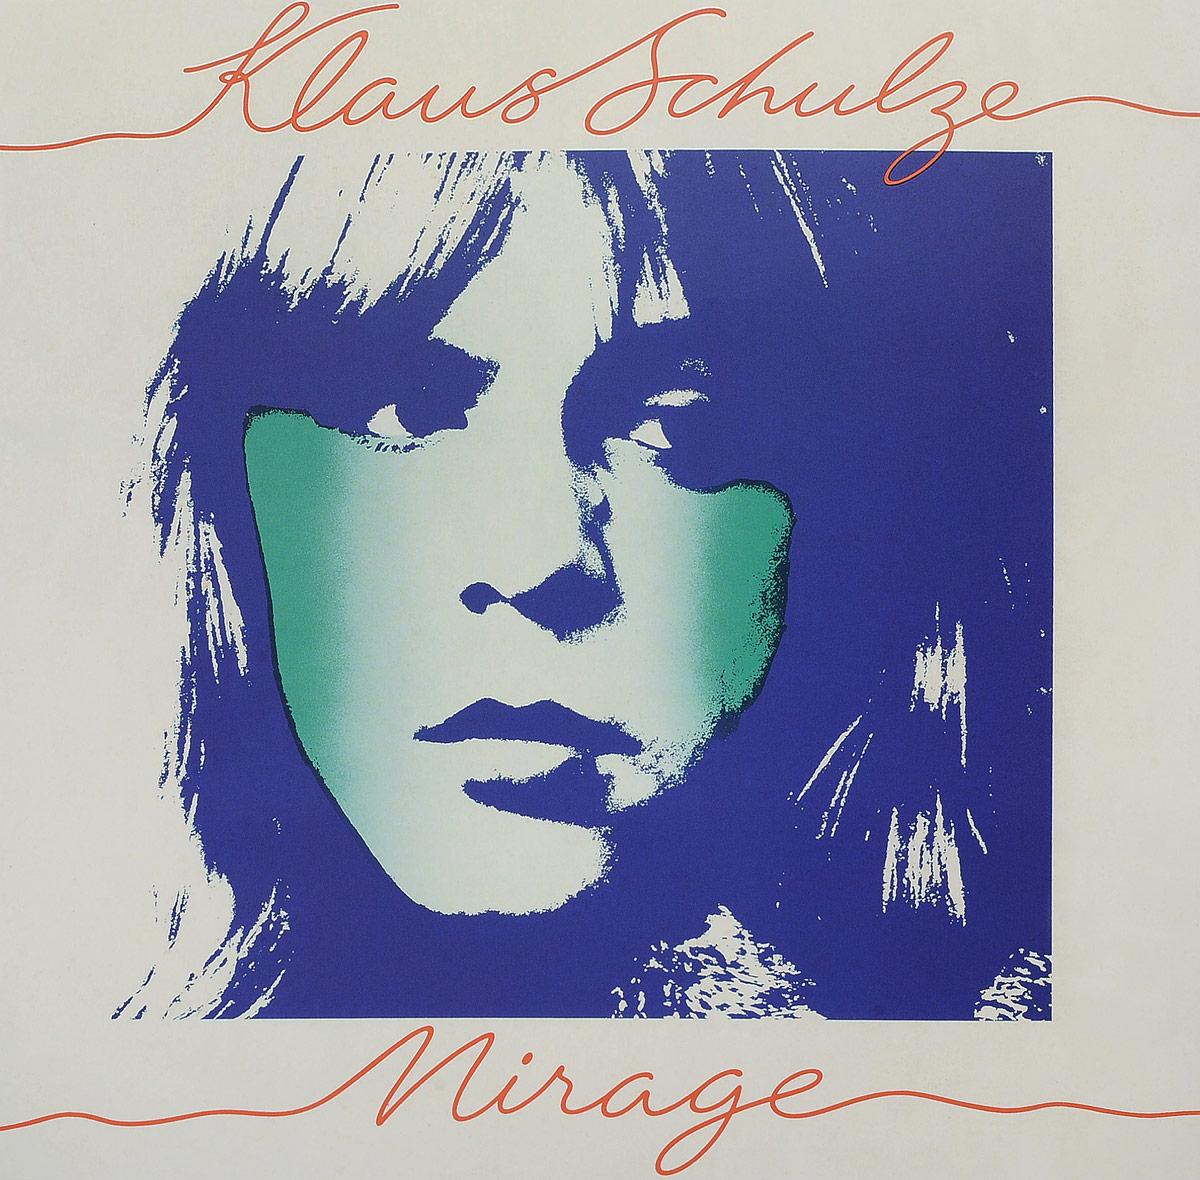 Klaus Schulze. Mirage (LP)